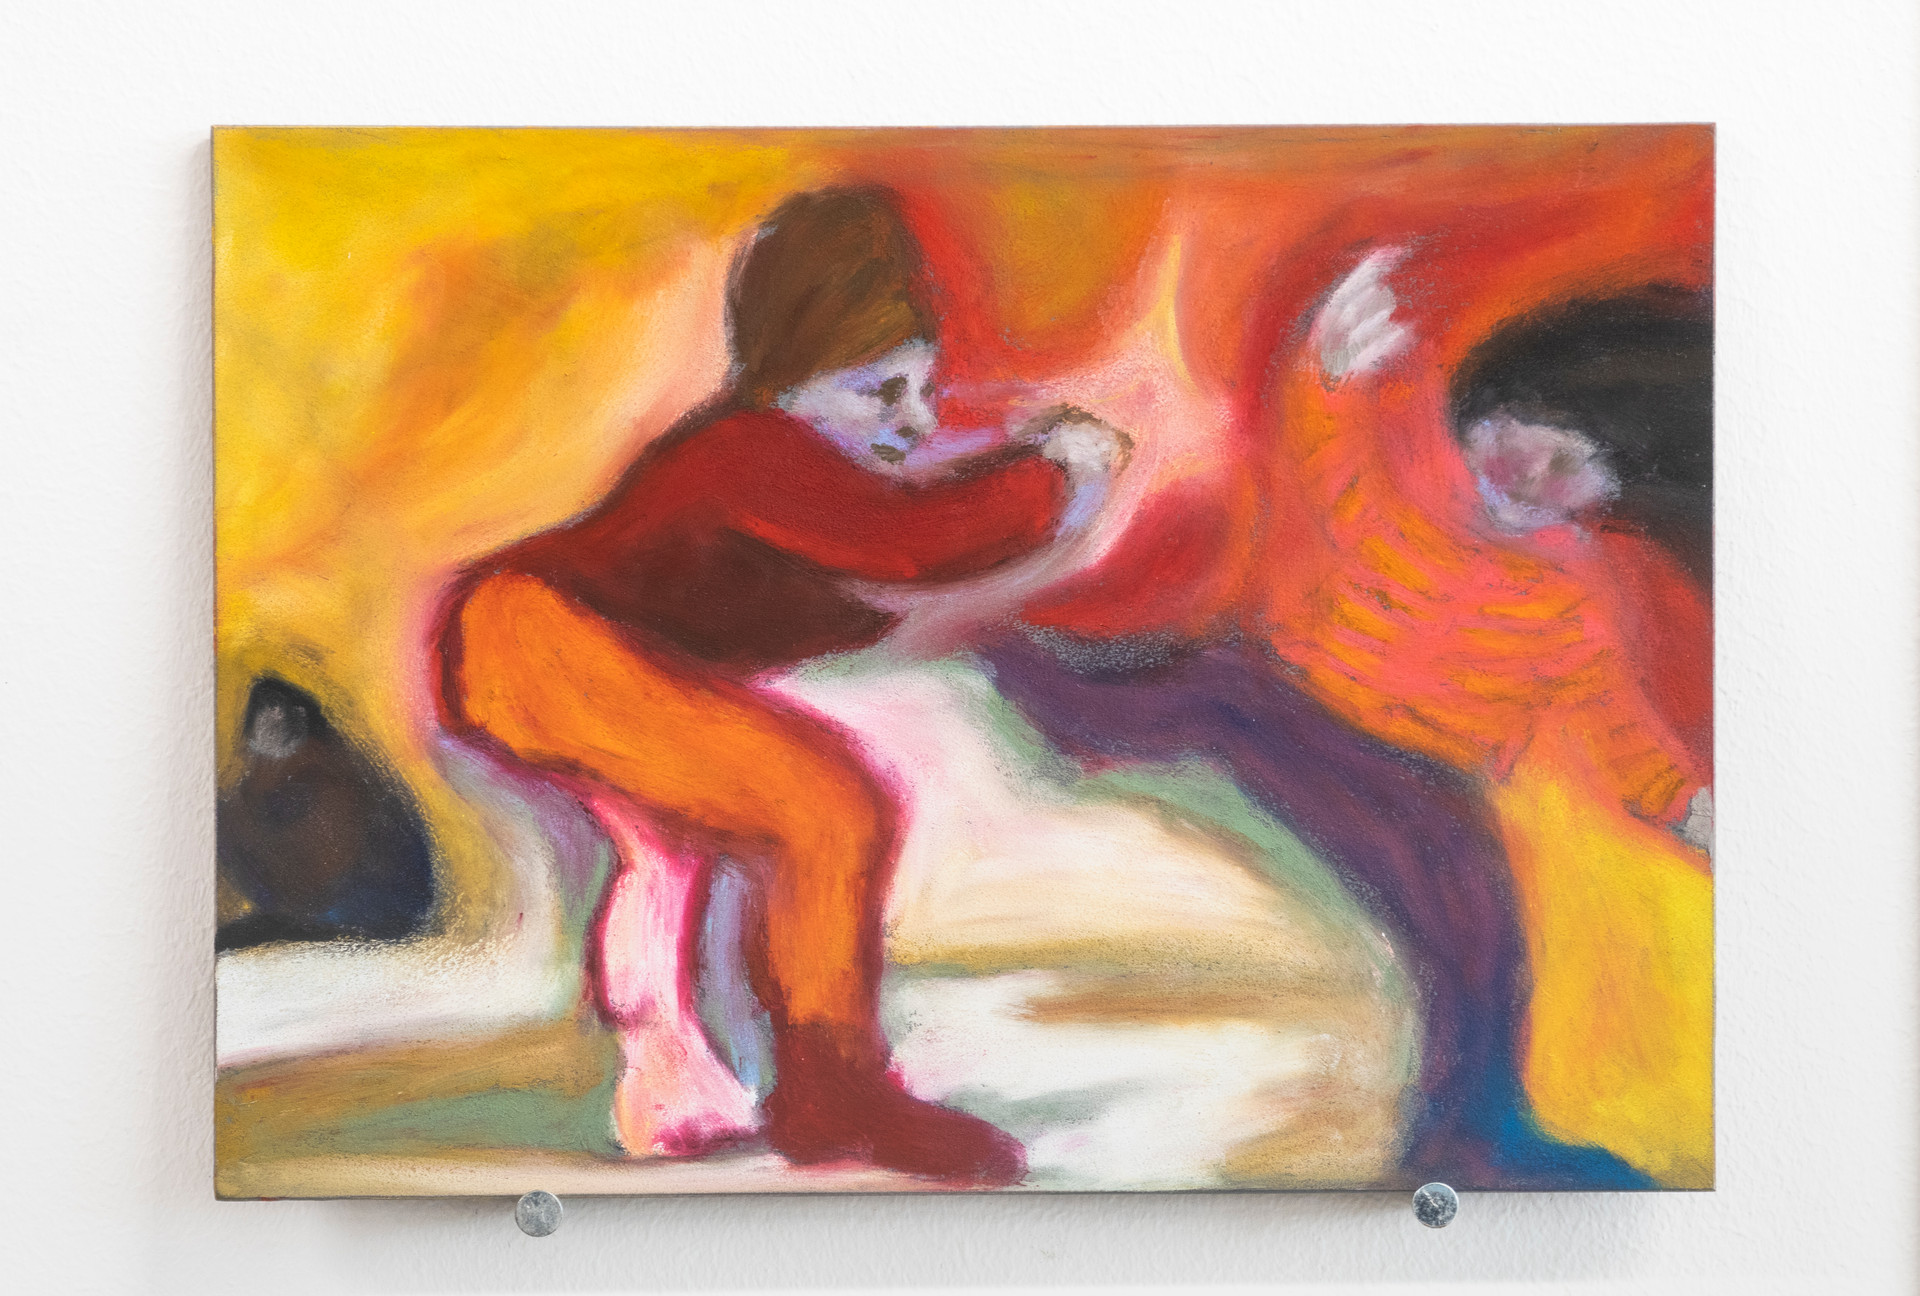 Eleanor Wang, Balancing on Jujube Berries, Oil pastel on panel, 17.8 x 12.7cm